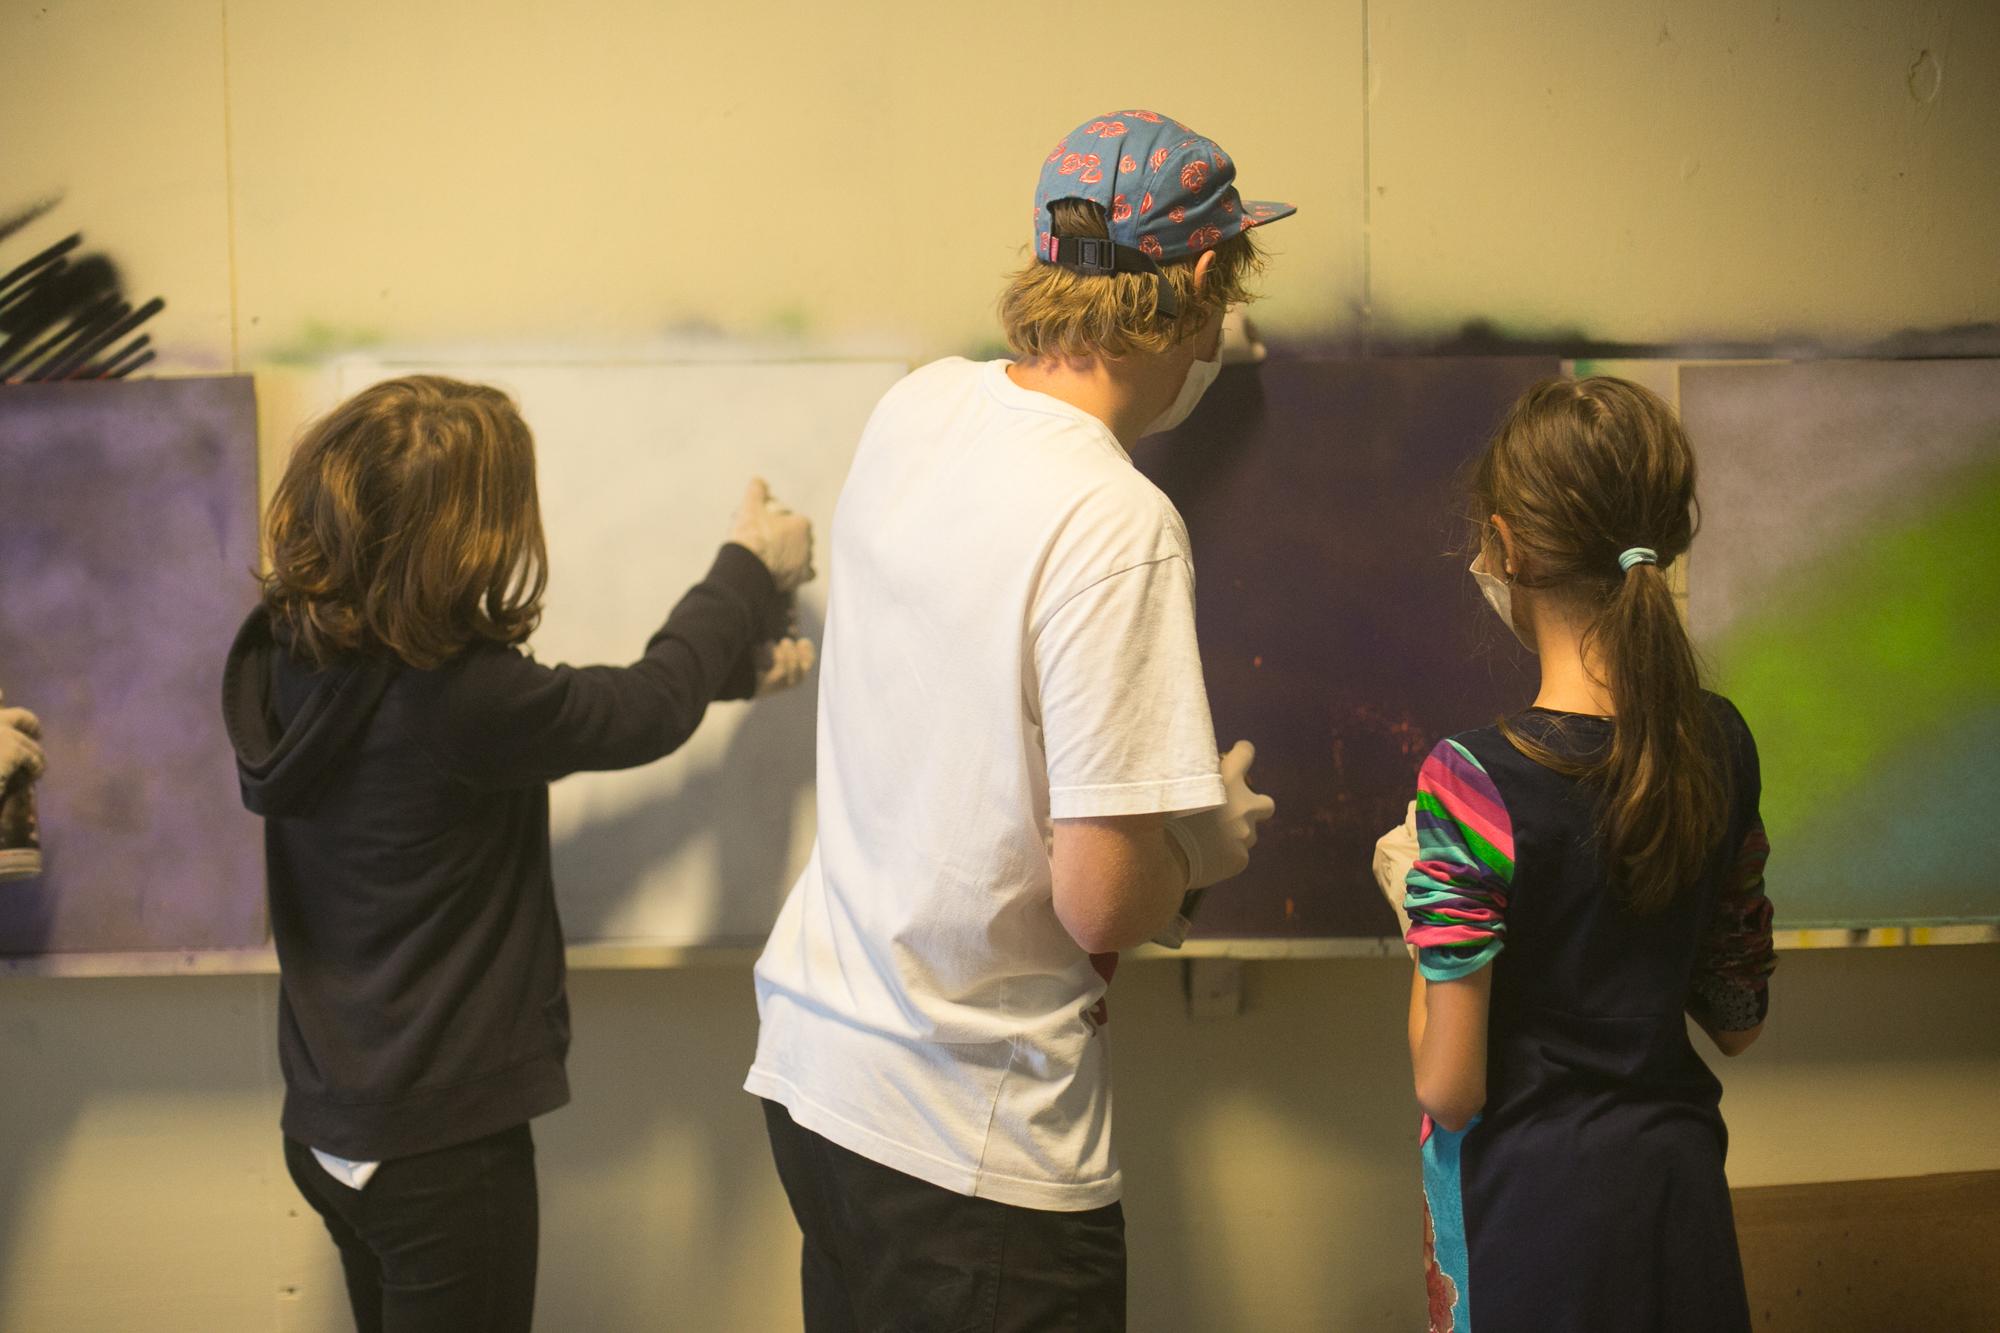 Graffitiles Graffitiworkshop Kinderfeestje opvang skateparksweatshop 2015.jpg